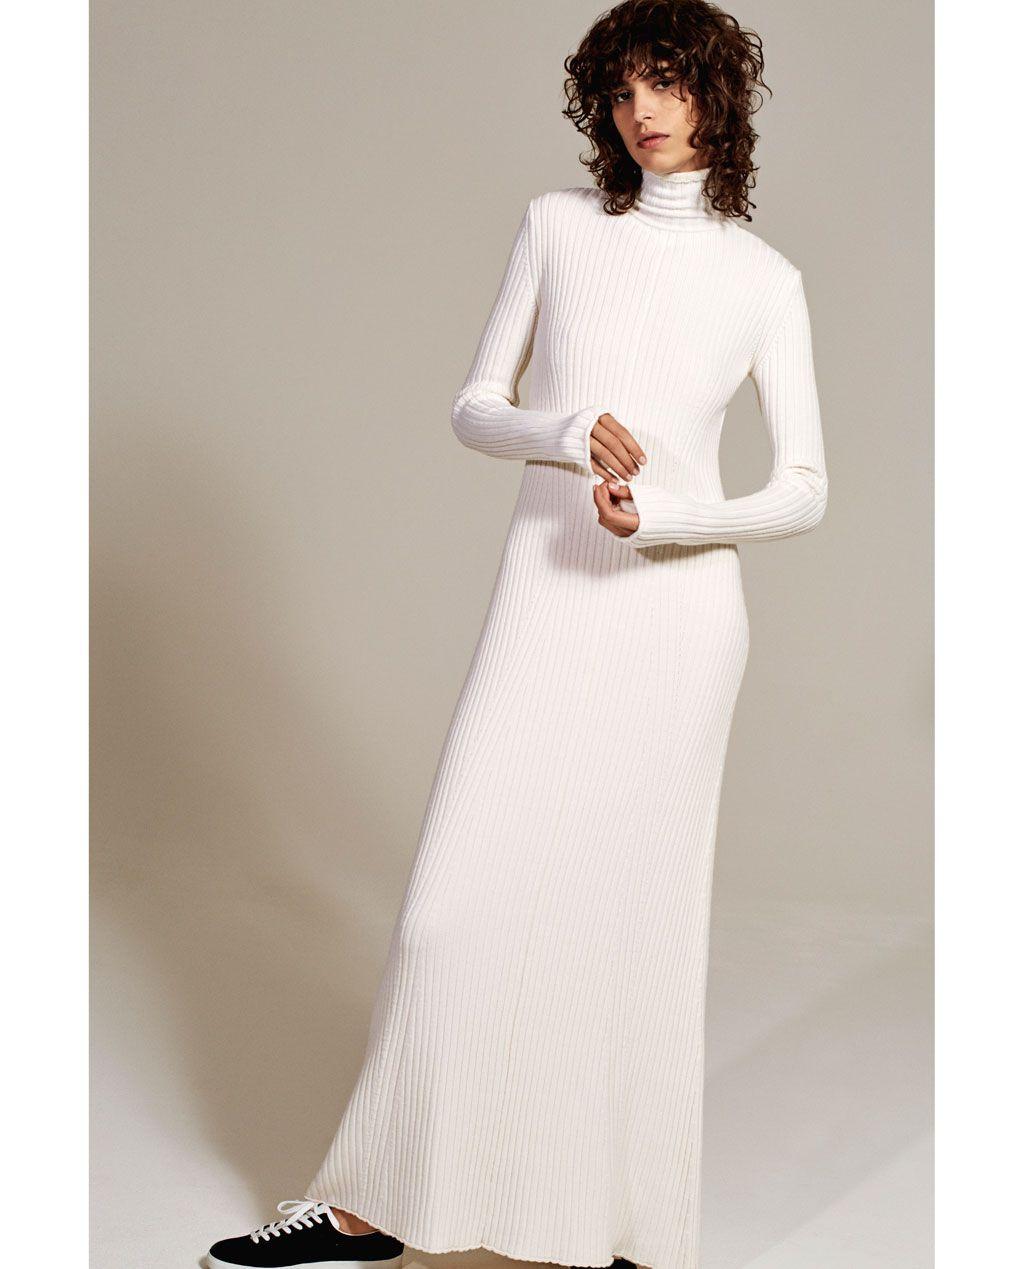 off-the-shoulder midi dress-dresses-woman | zara united